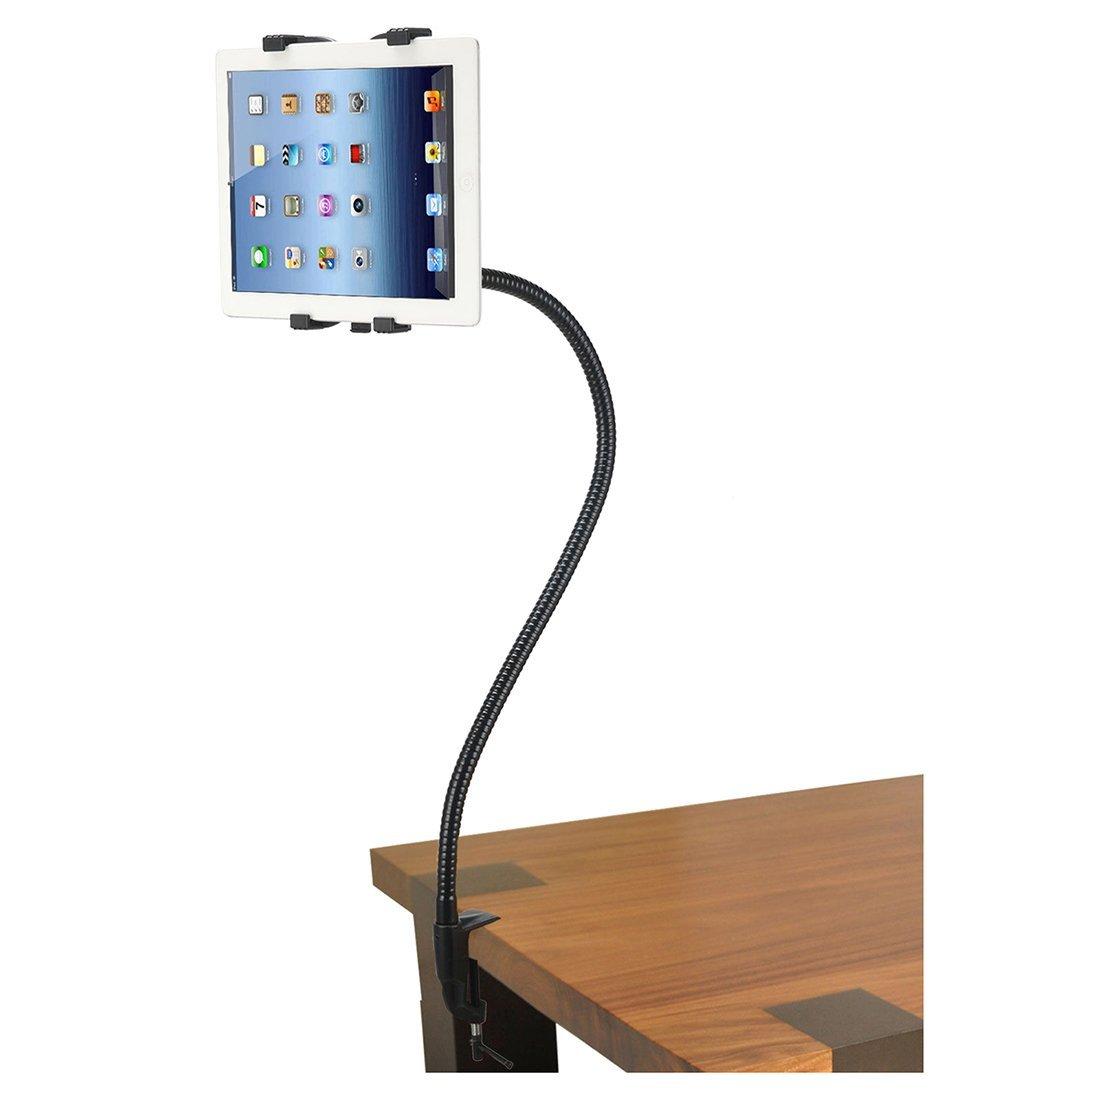 Desk Stand - TOOGOO(R)Gooseneck 360 Lazy Bed Desk Stand Holder Mount-iPad 2 3 4 Air Mini Tablet Black